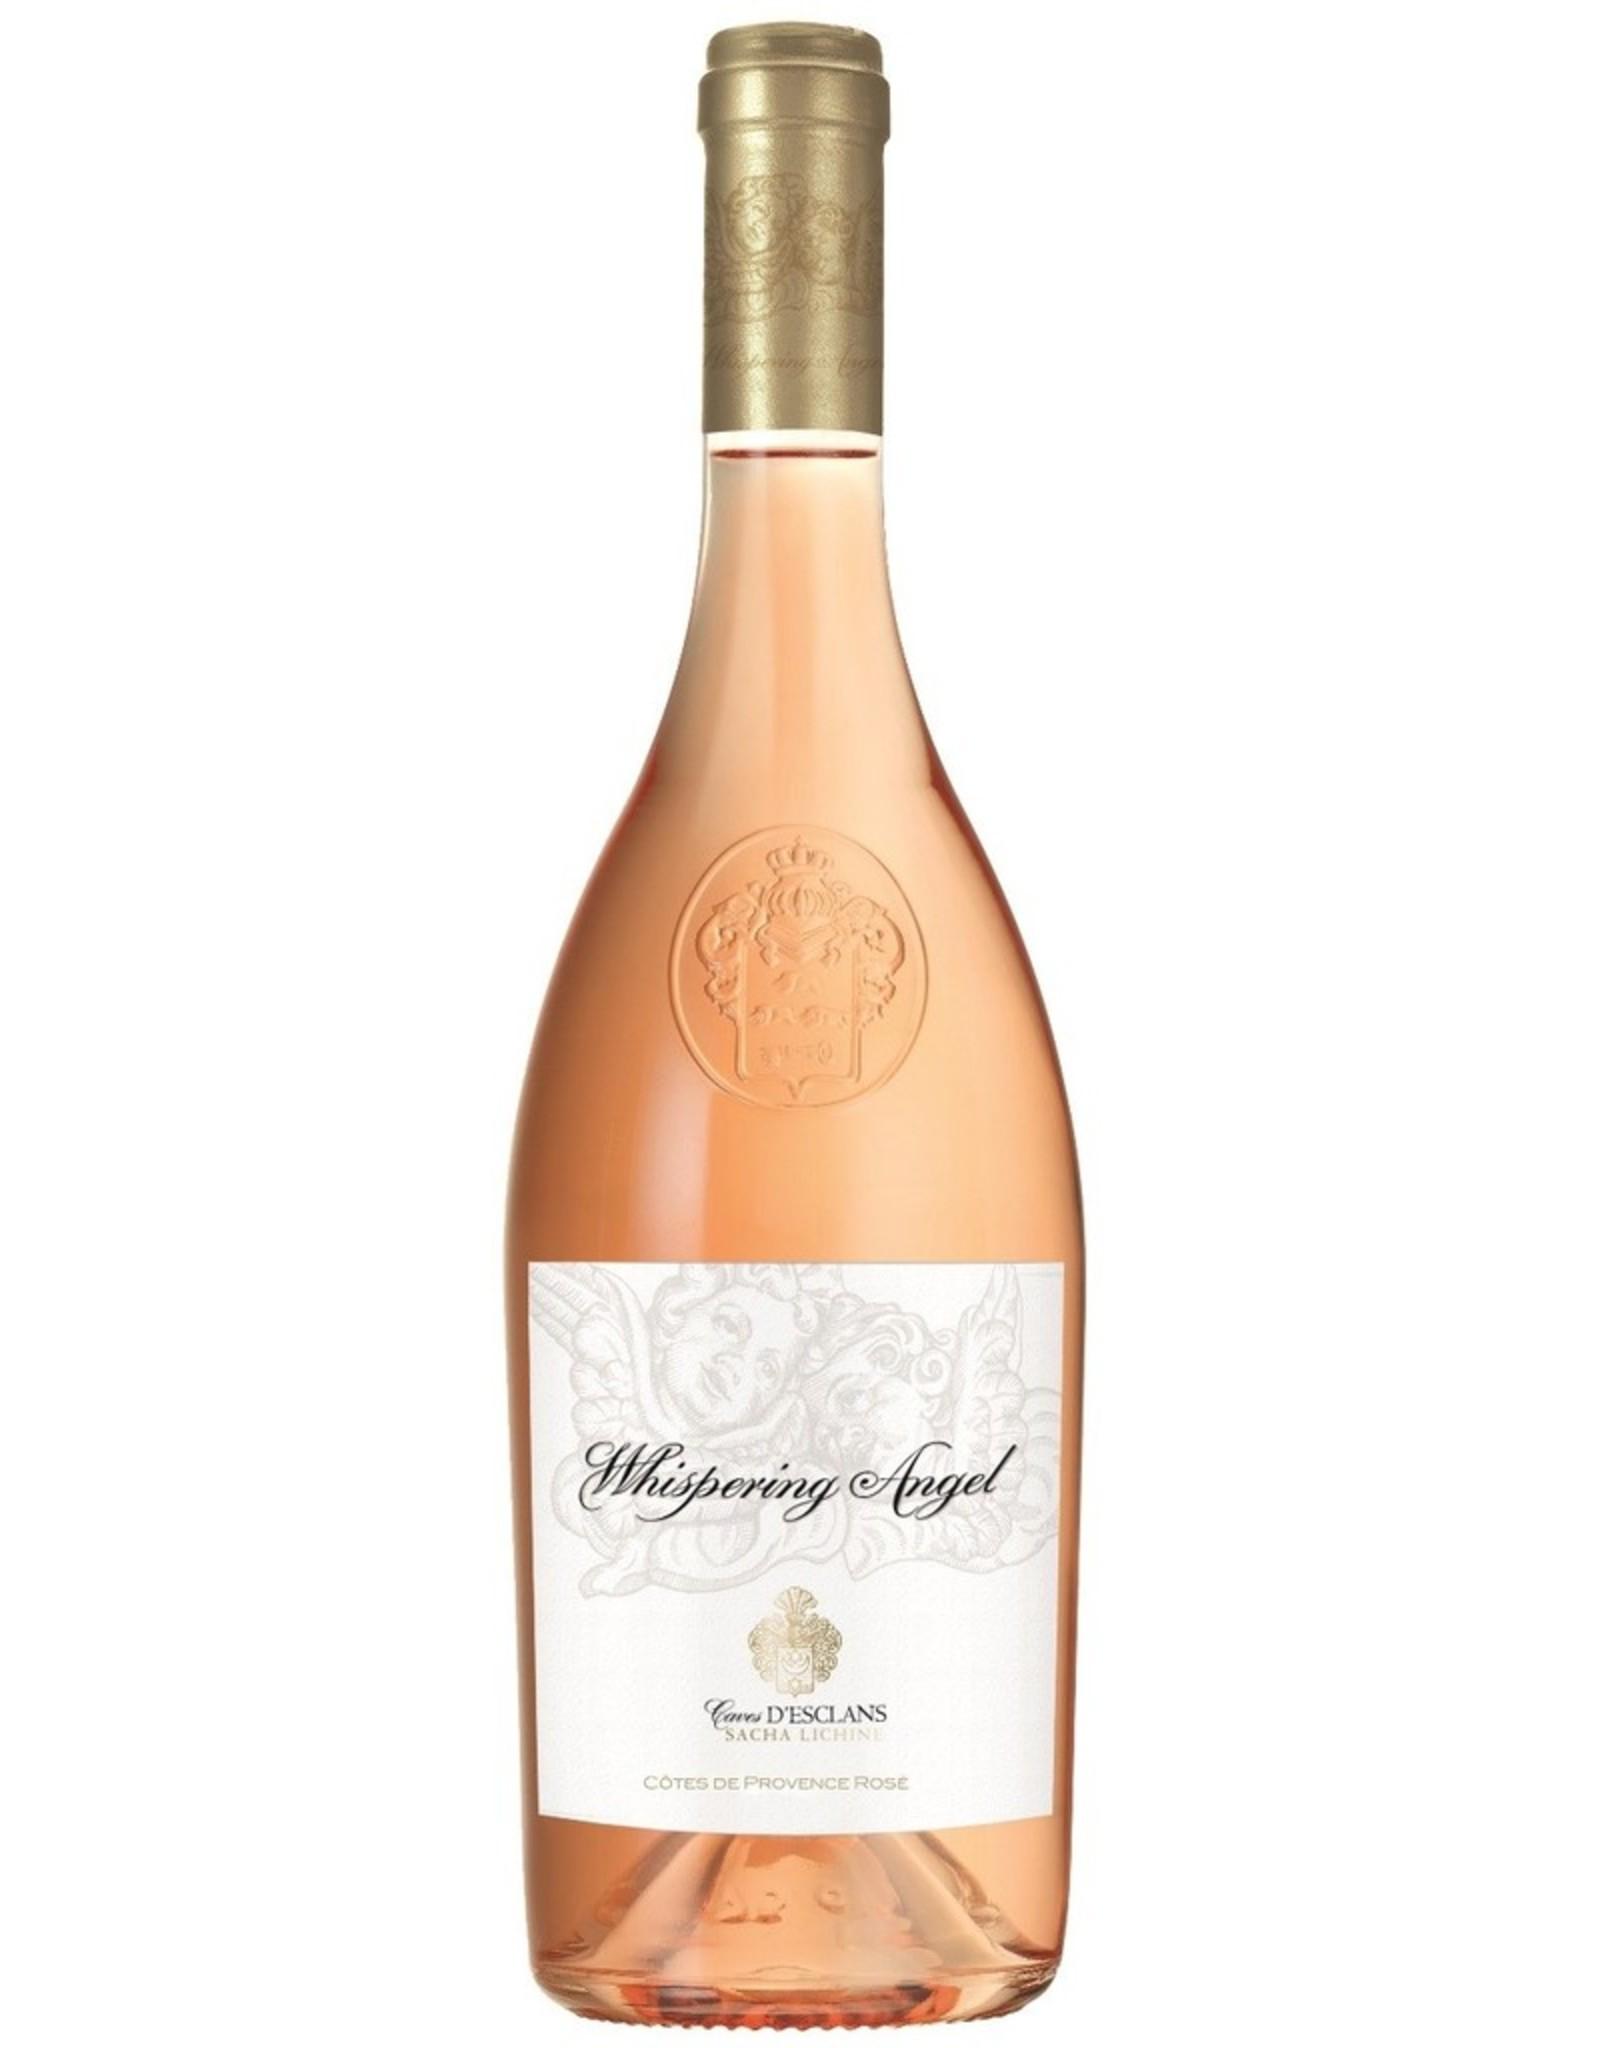 Rose Wine 2020, Chateau d'Esclans Whispering Angel 750ml, Rose, Cotes De Provence, Provence, France, 13% Alc, CT88